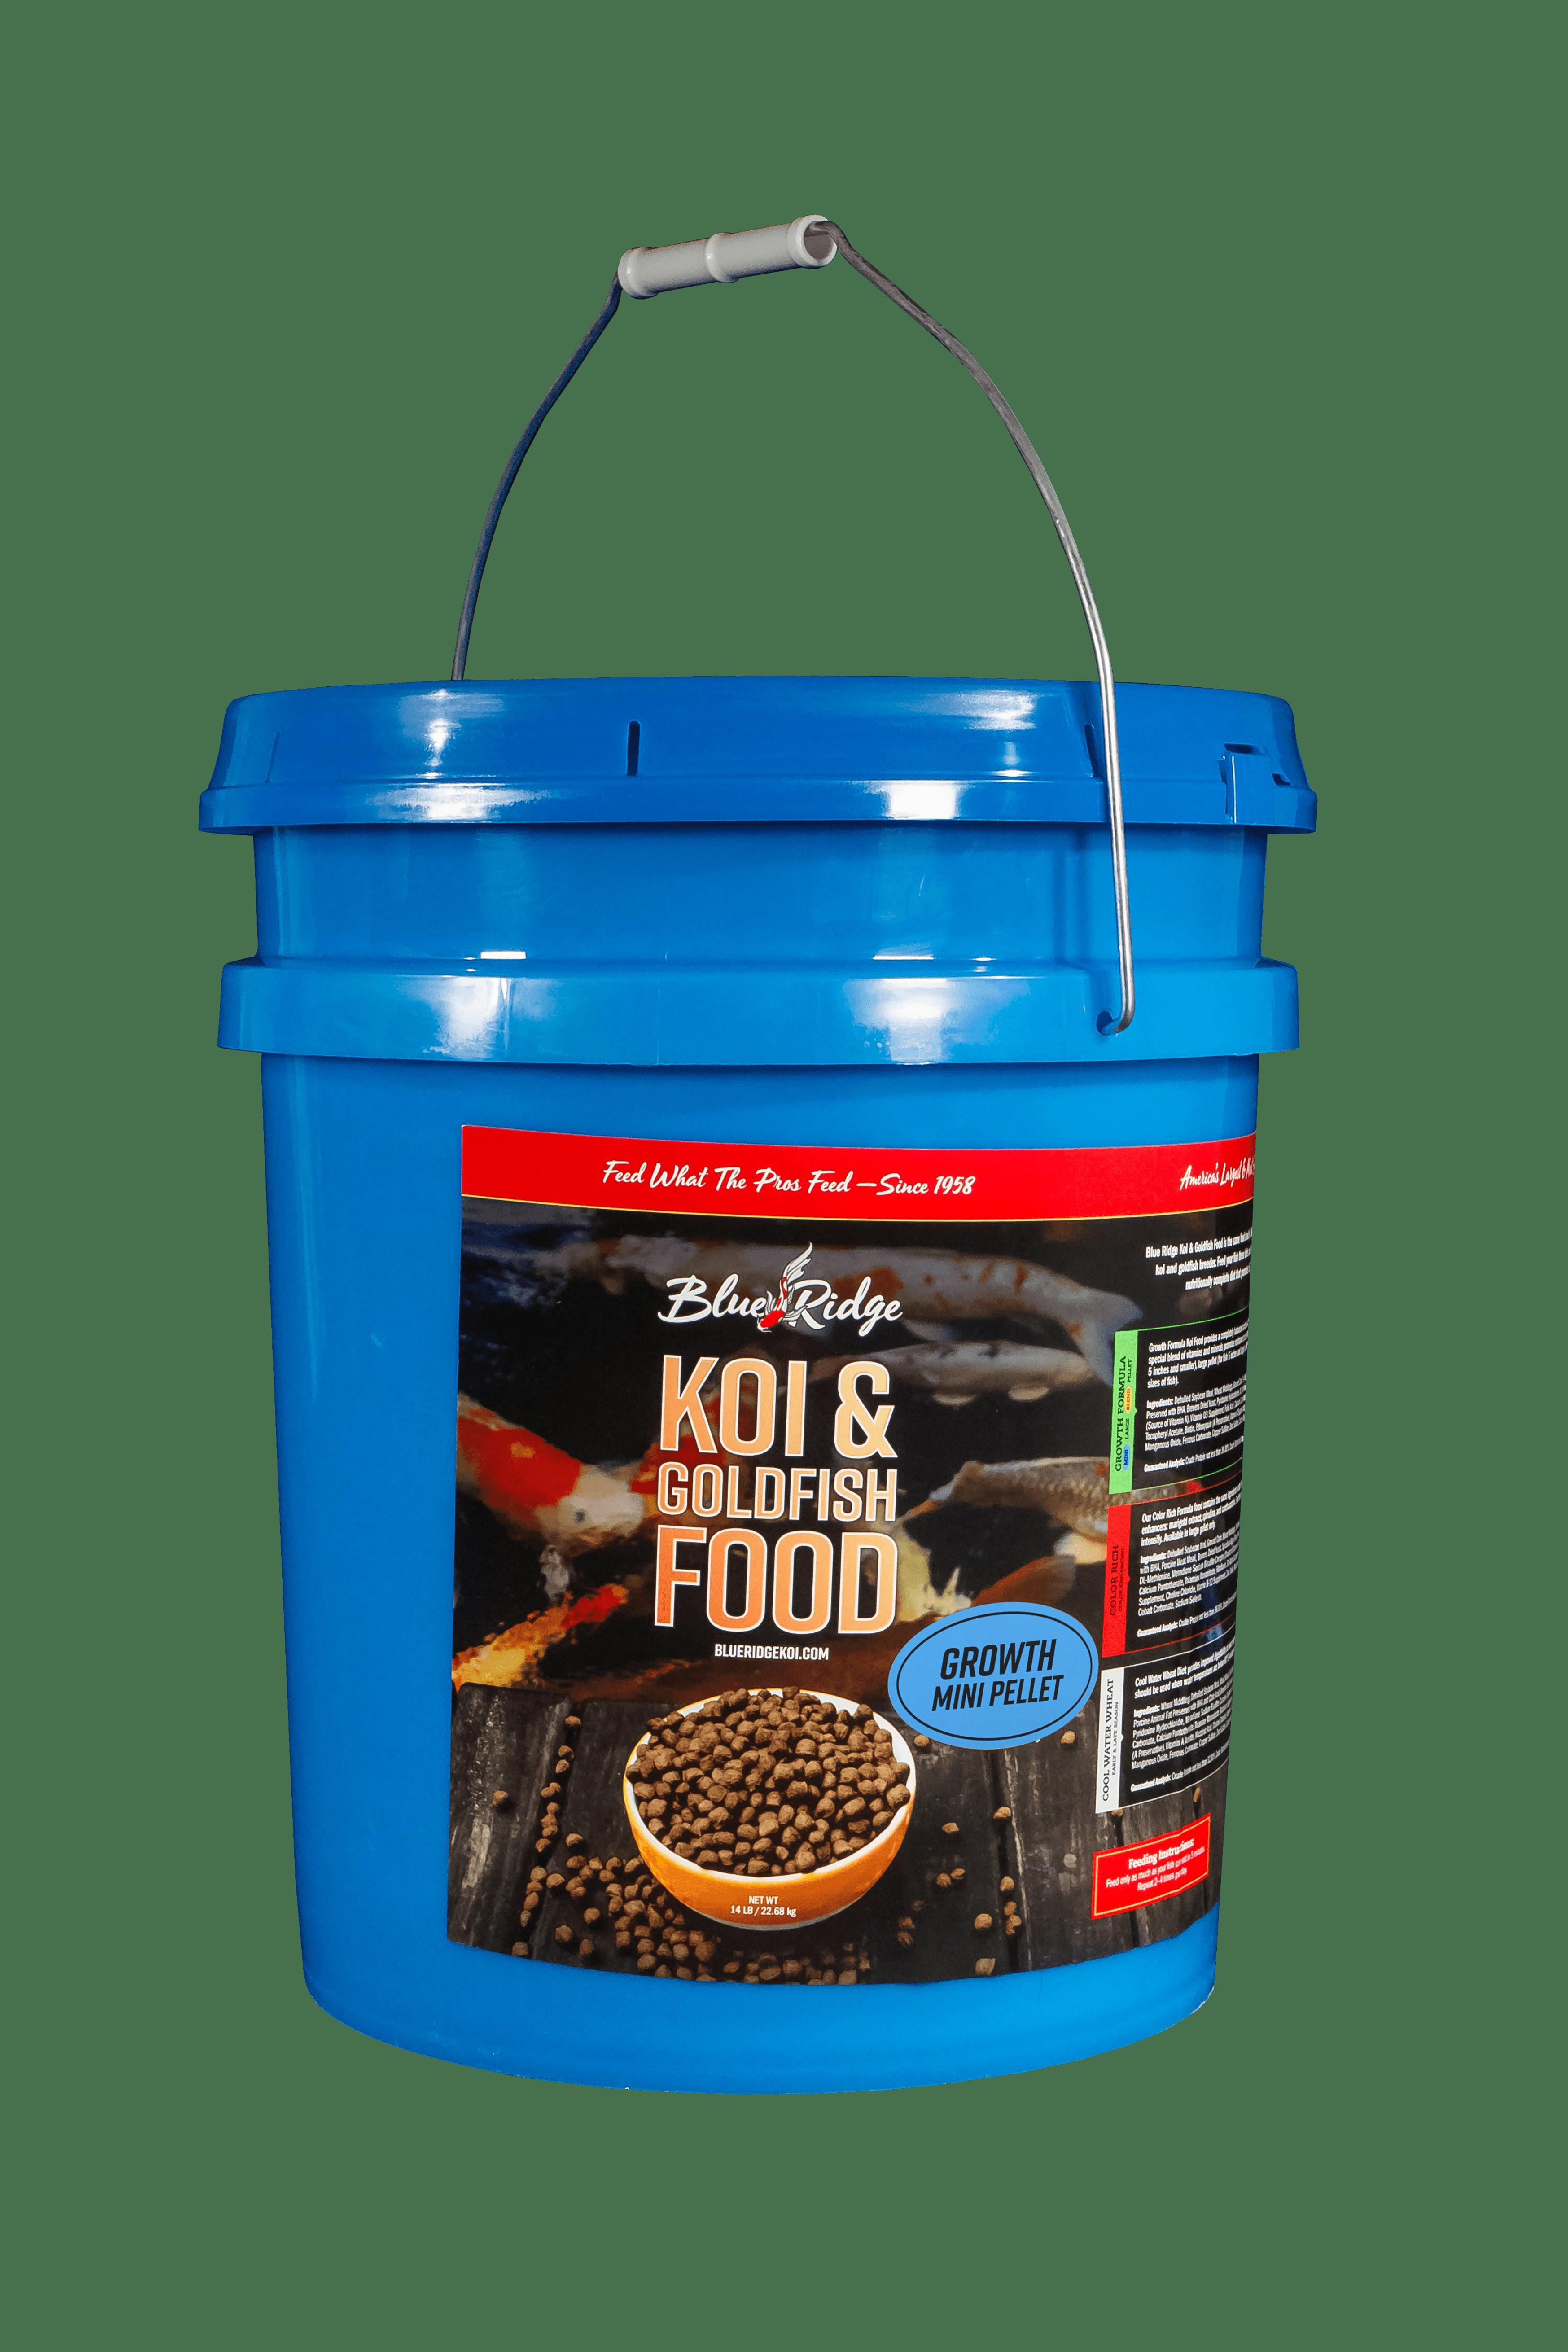 Blue Ridge Growth Formula Koi & Goldfish Food, Mini Fish Food Pellets, 14 lb by Blue Ridge Koi & Goldfish